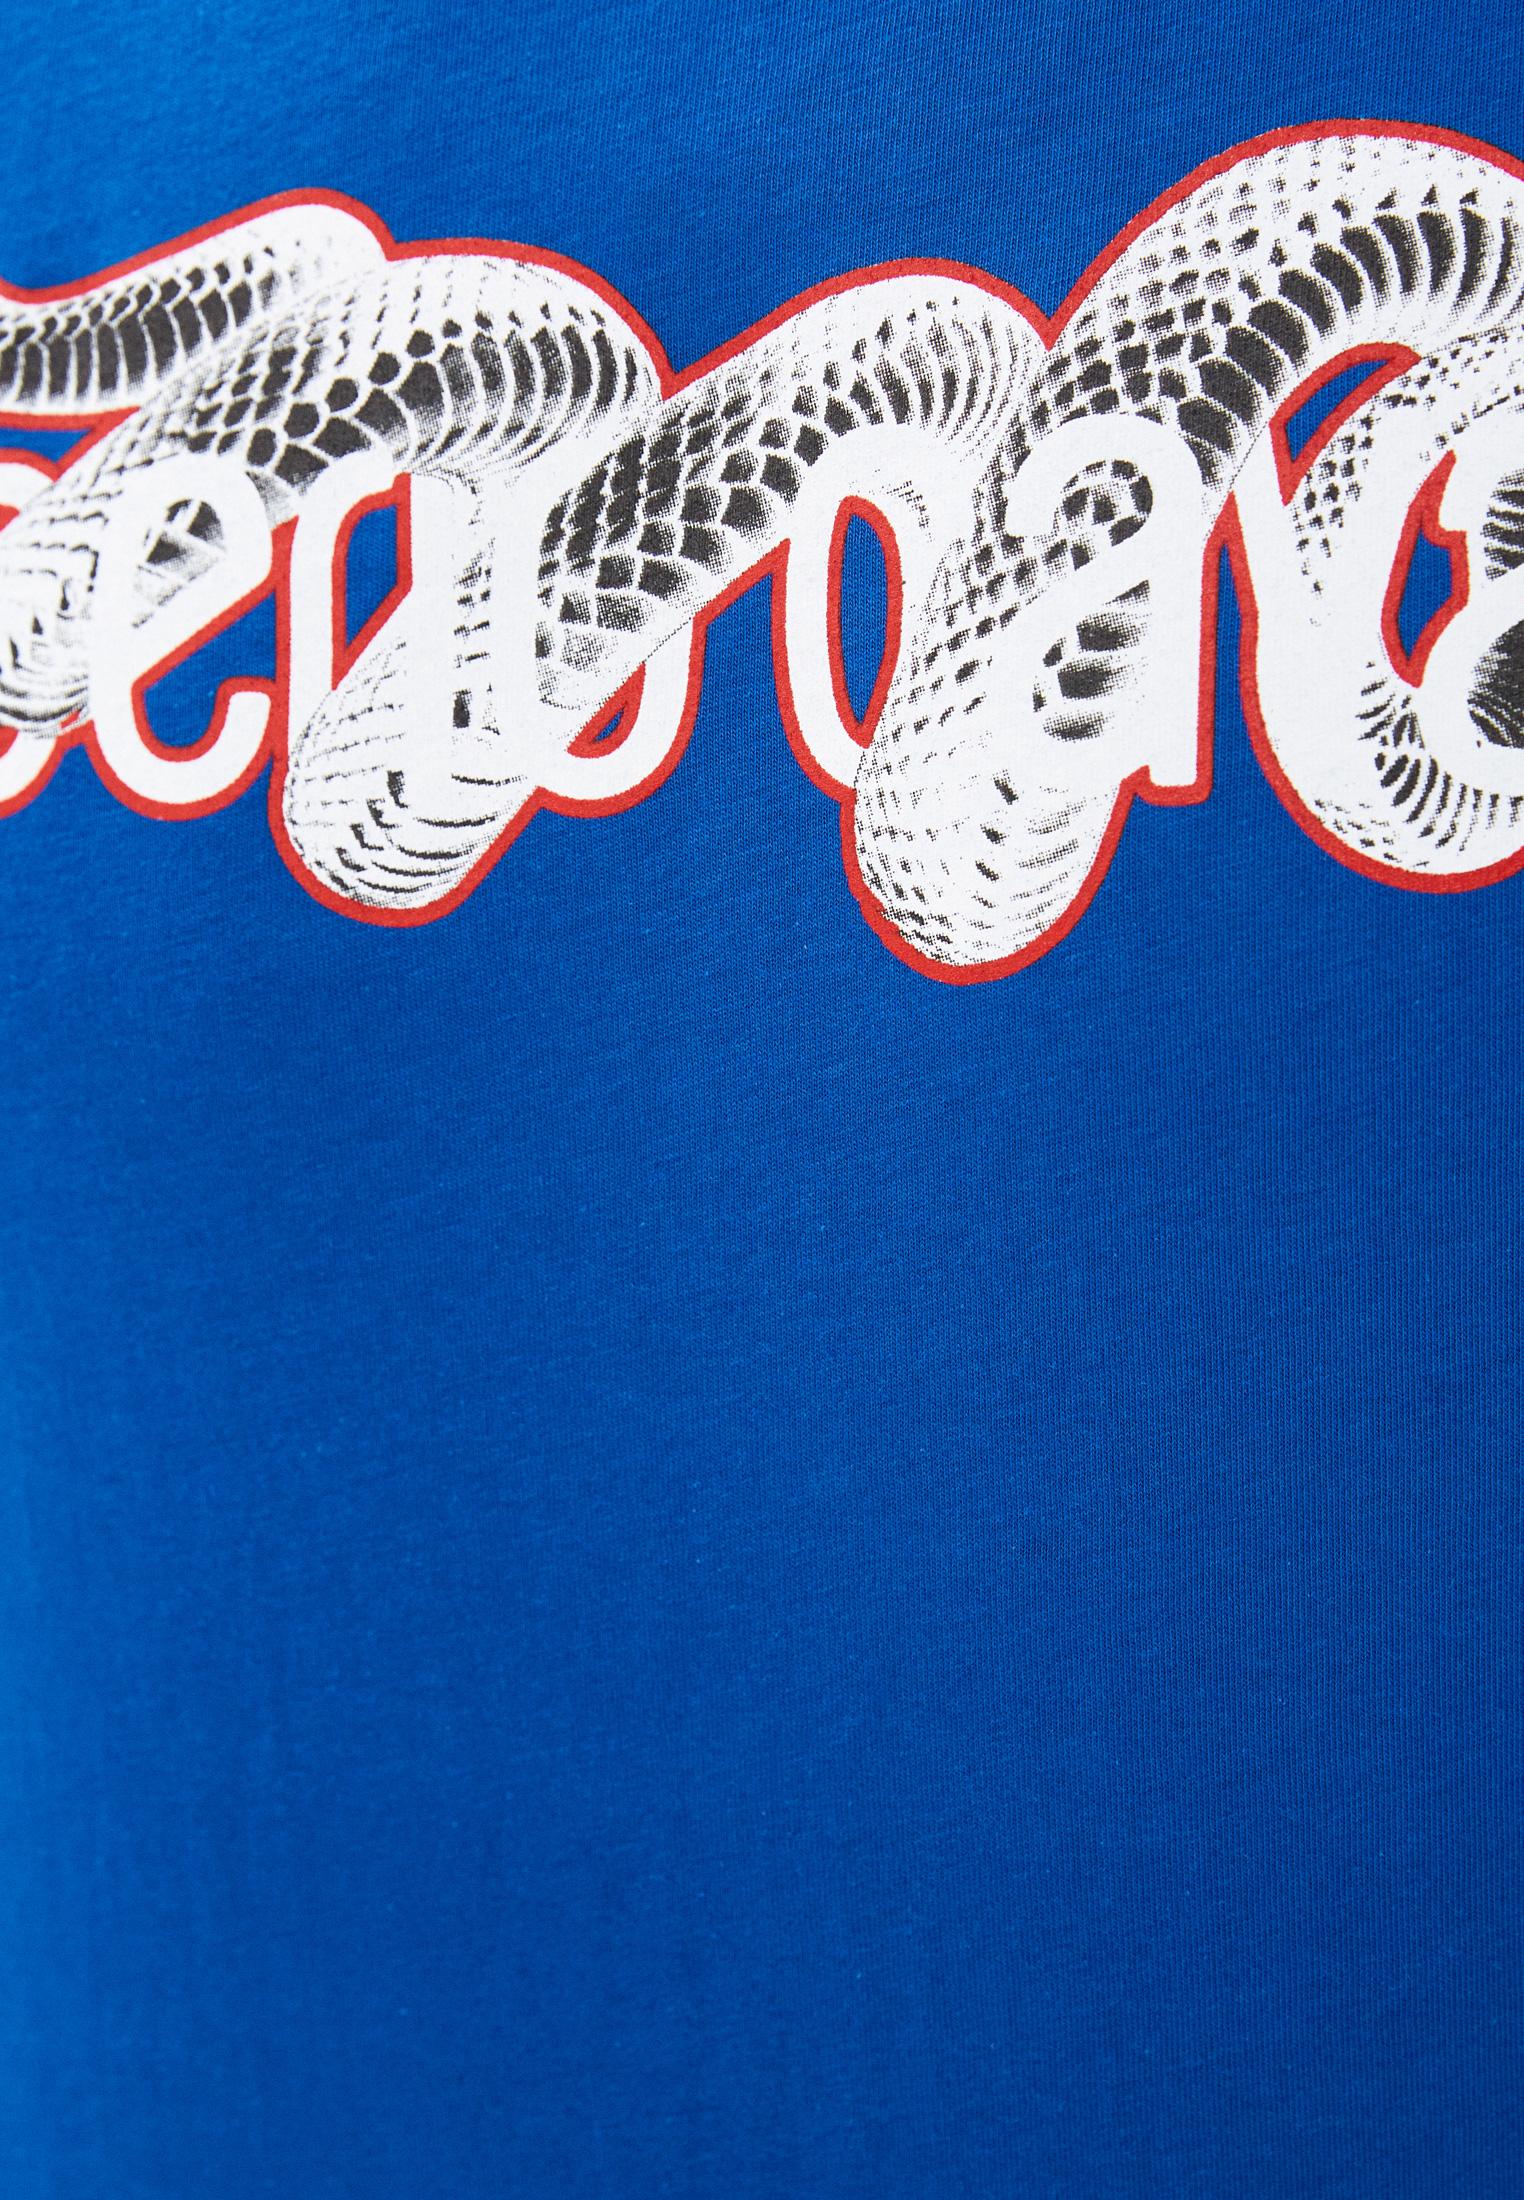 Мужская футболка Roberto Cavalli (Роберто Кавалли) GST655A027: изображение 5